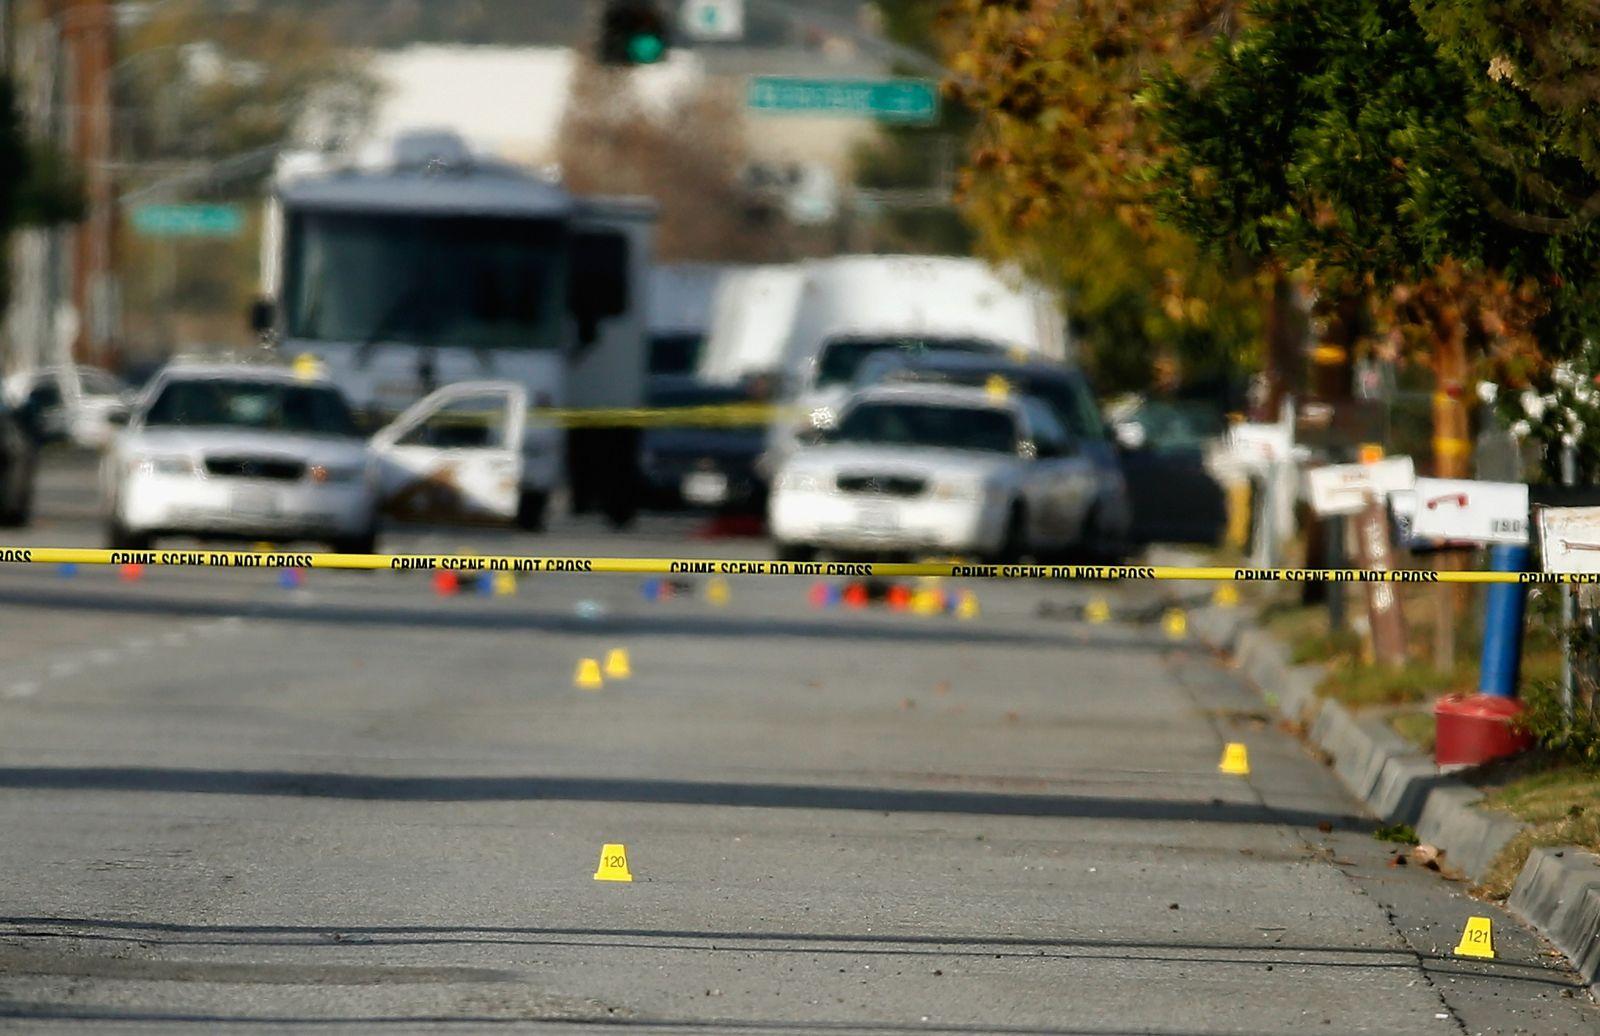 Anschlag San Bernardino